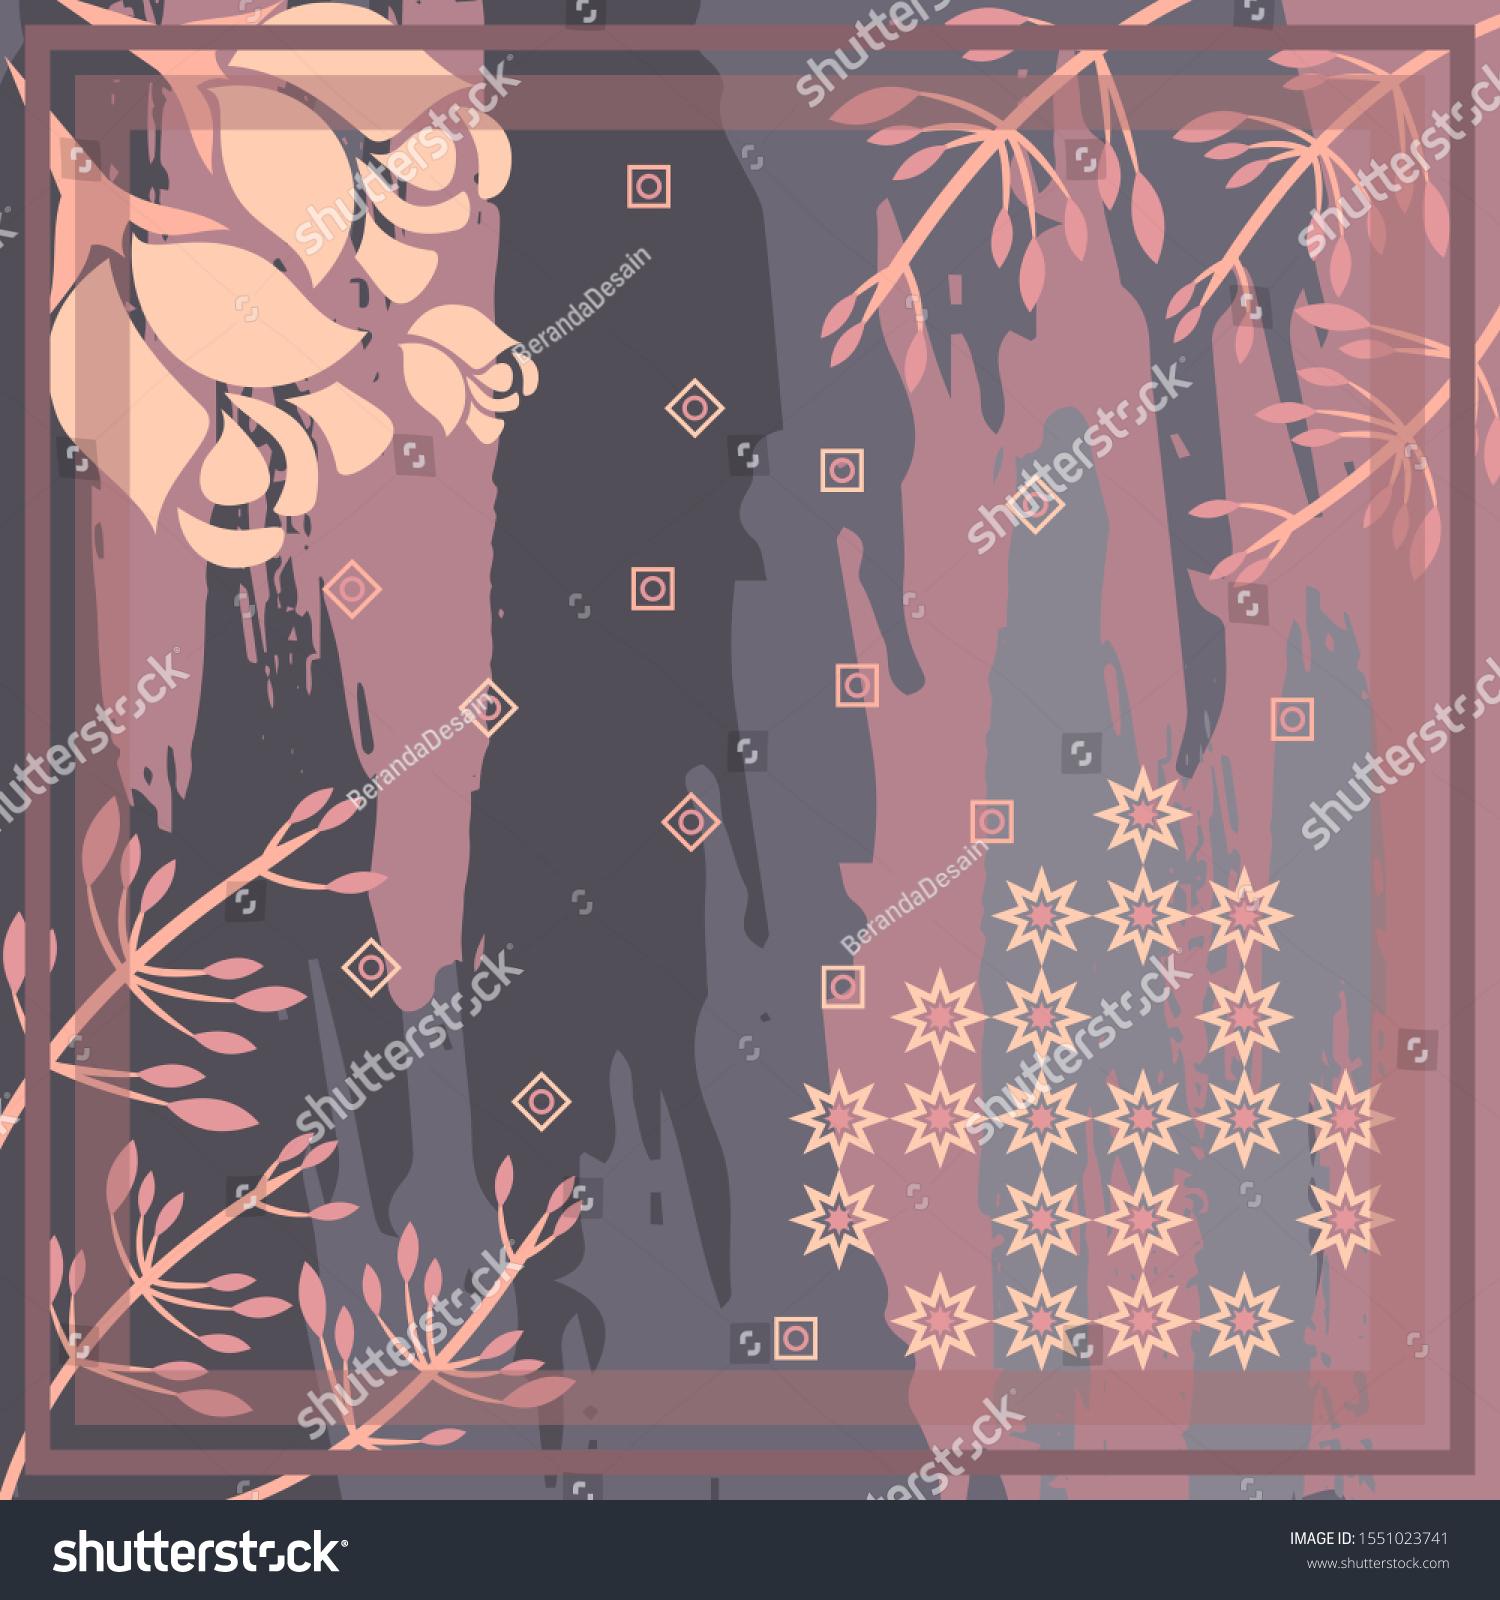 Pattern Hijab Motif Design Abstract Foliage Stock Vector (Royalty